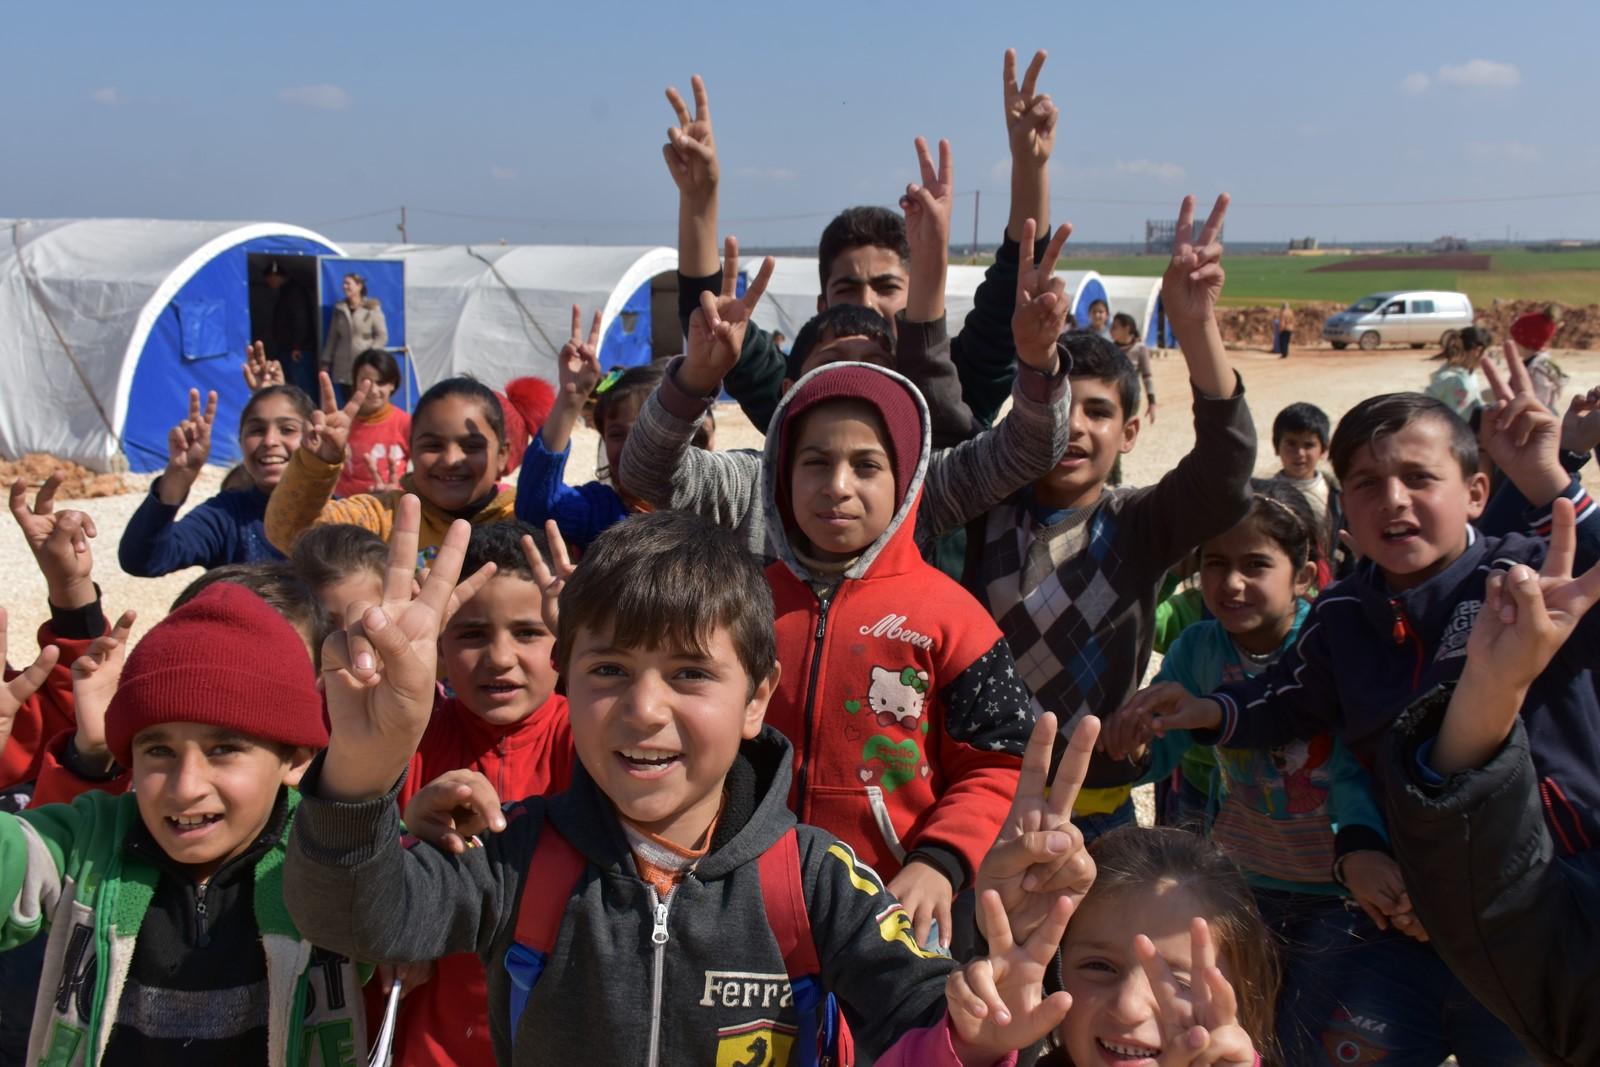 2 tents, poor possibilities to teach al-Awda camp's children